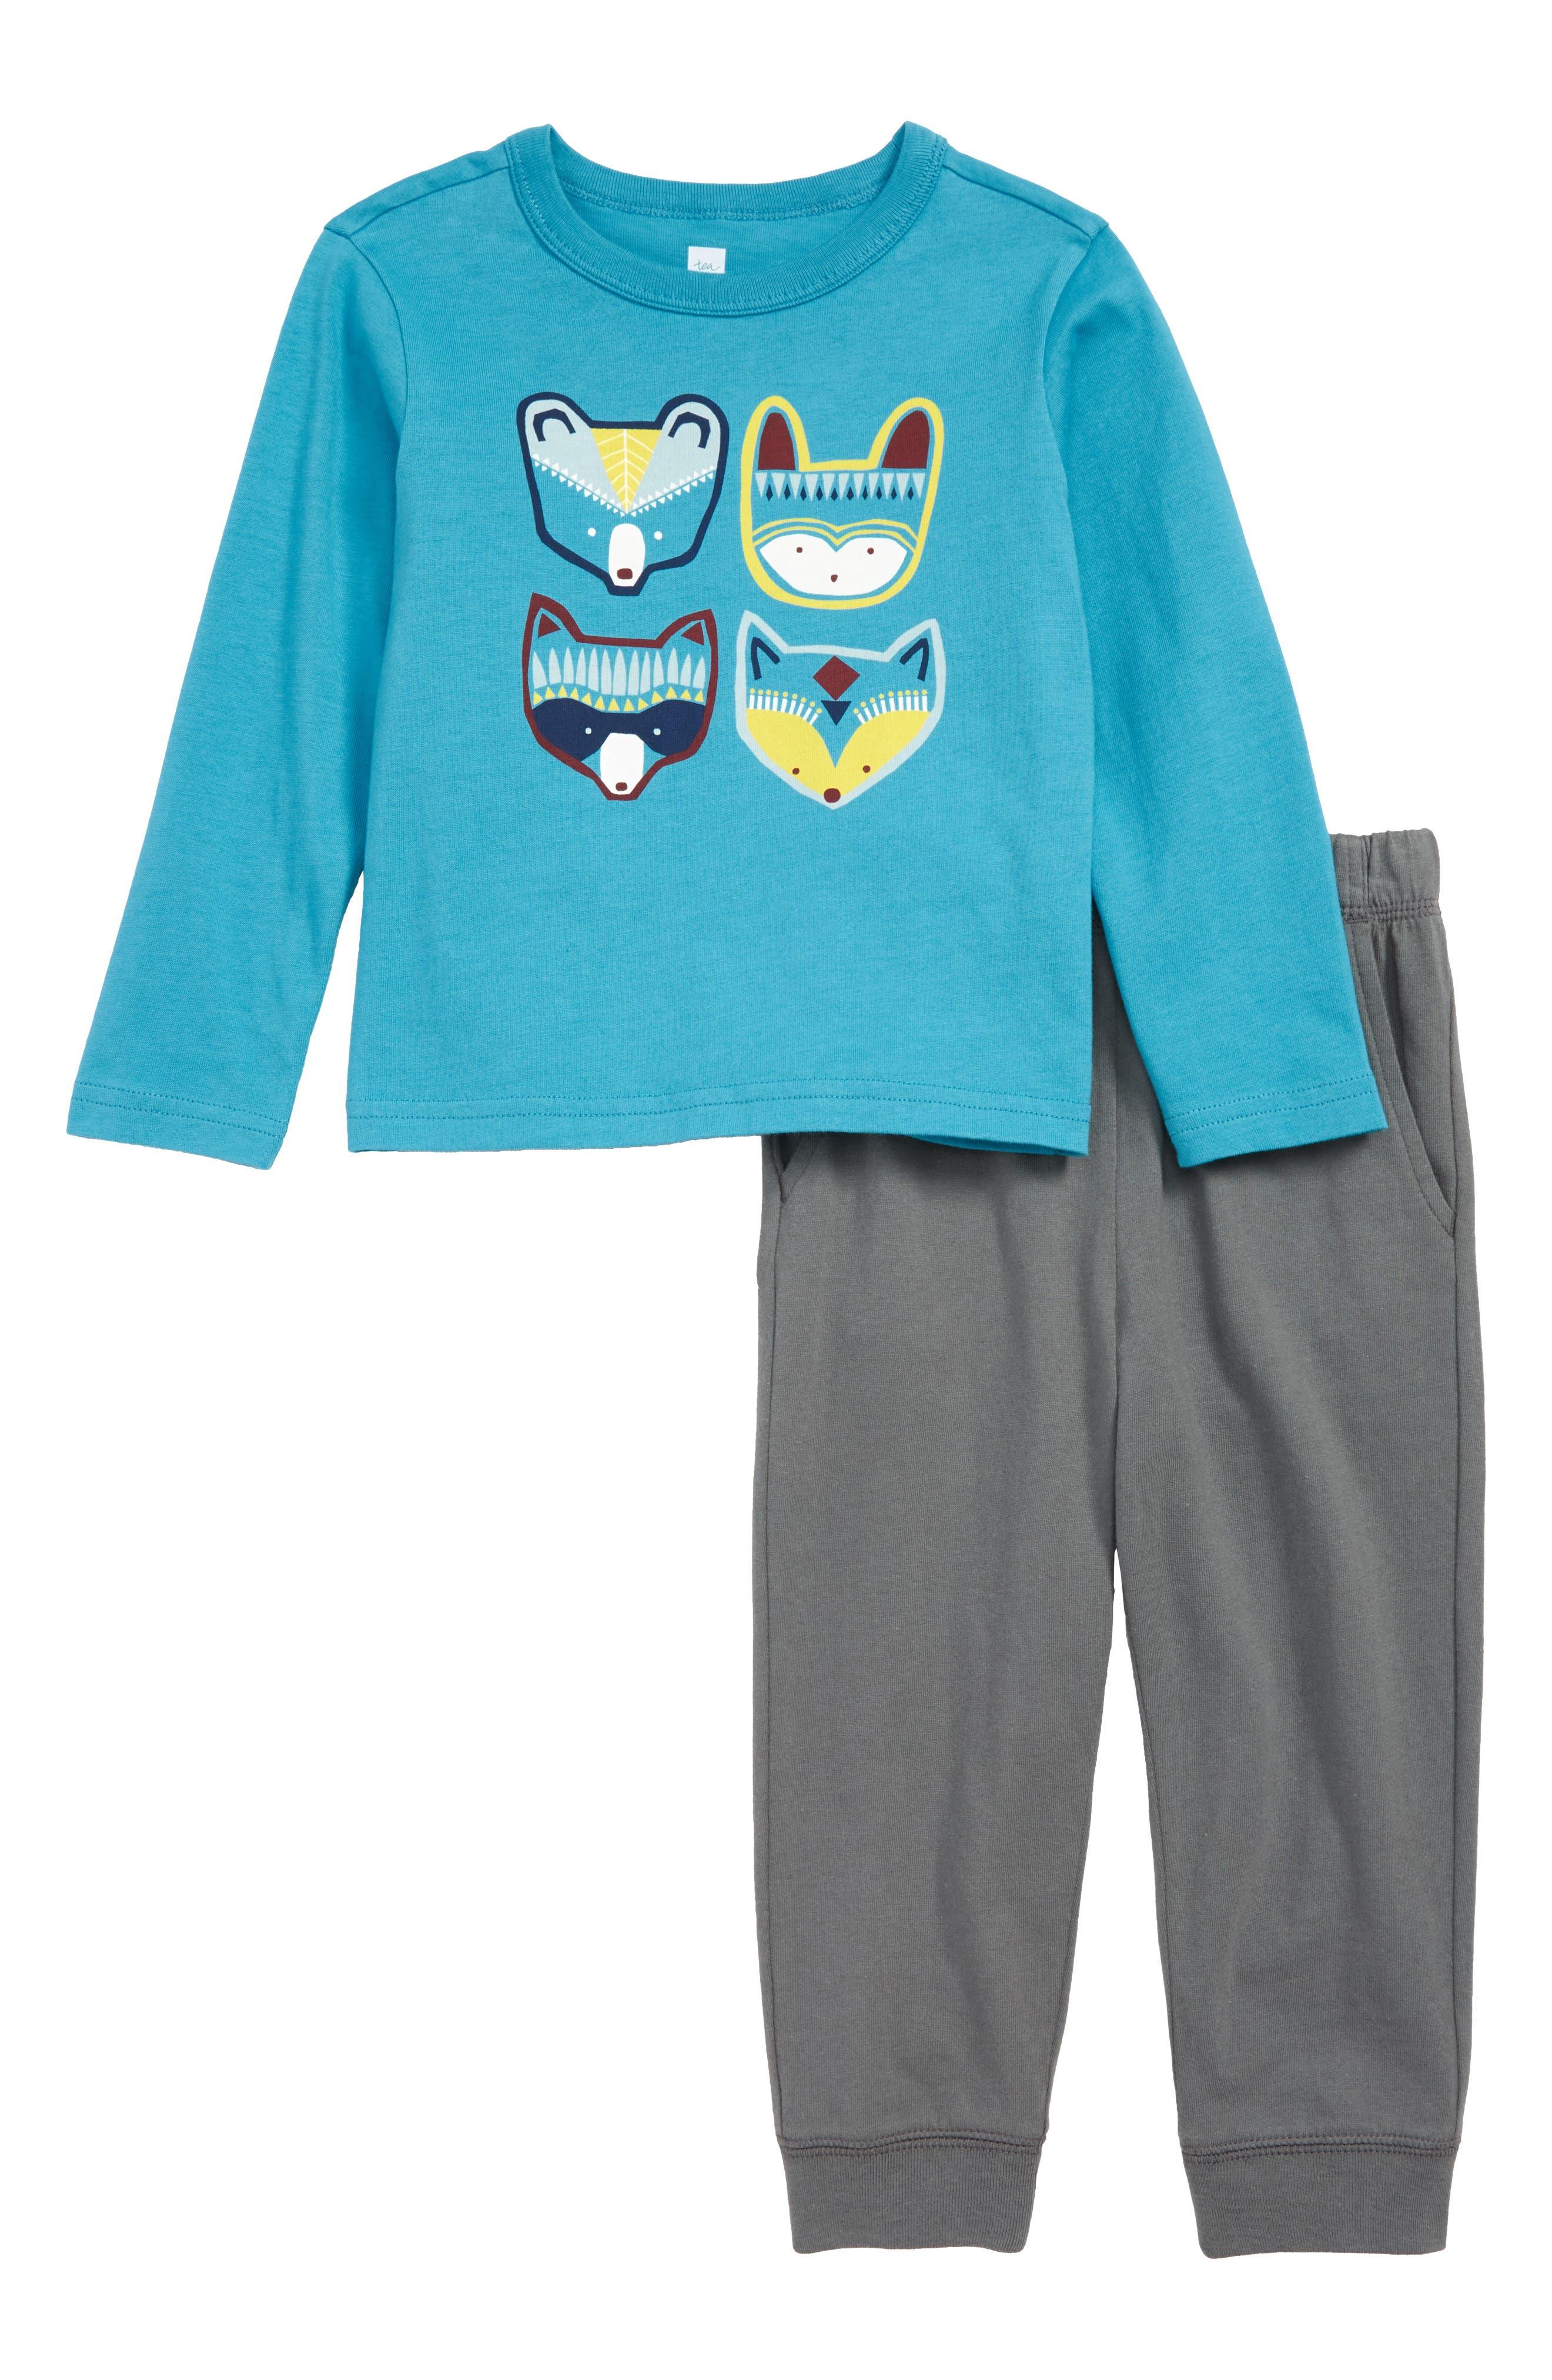 Infant Boys Tea Collection Critters TShirt  Sweatpants Set